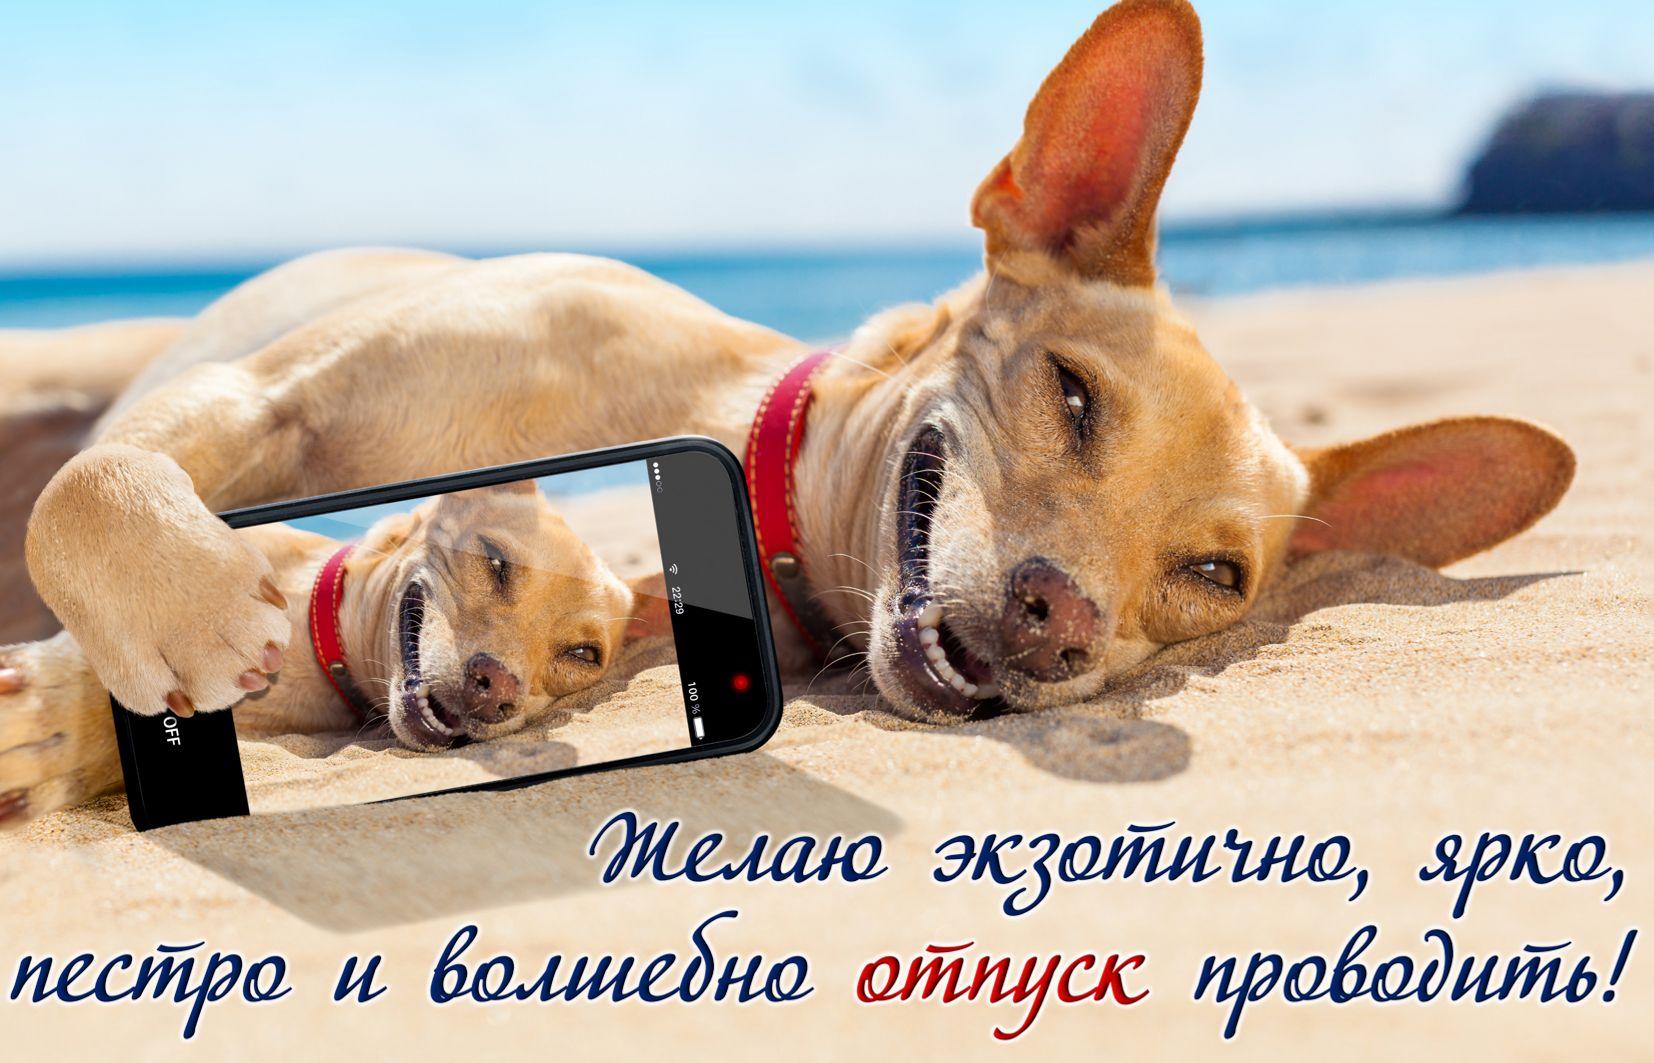 Открытка к отпуску - собачка со смартфоном на белом песке